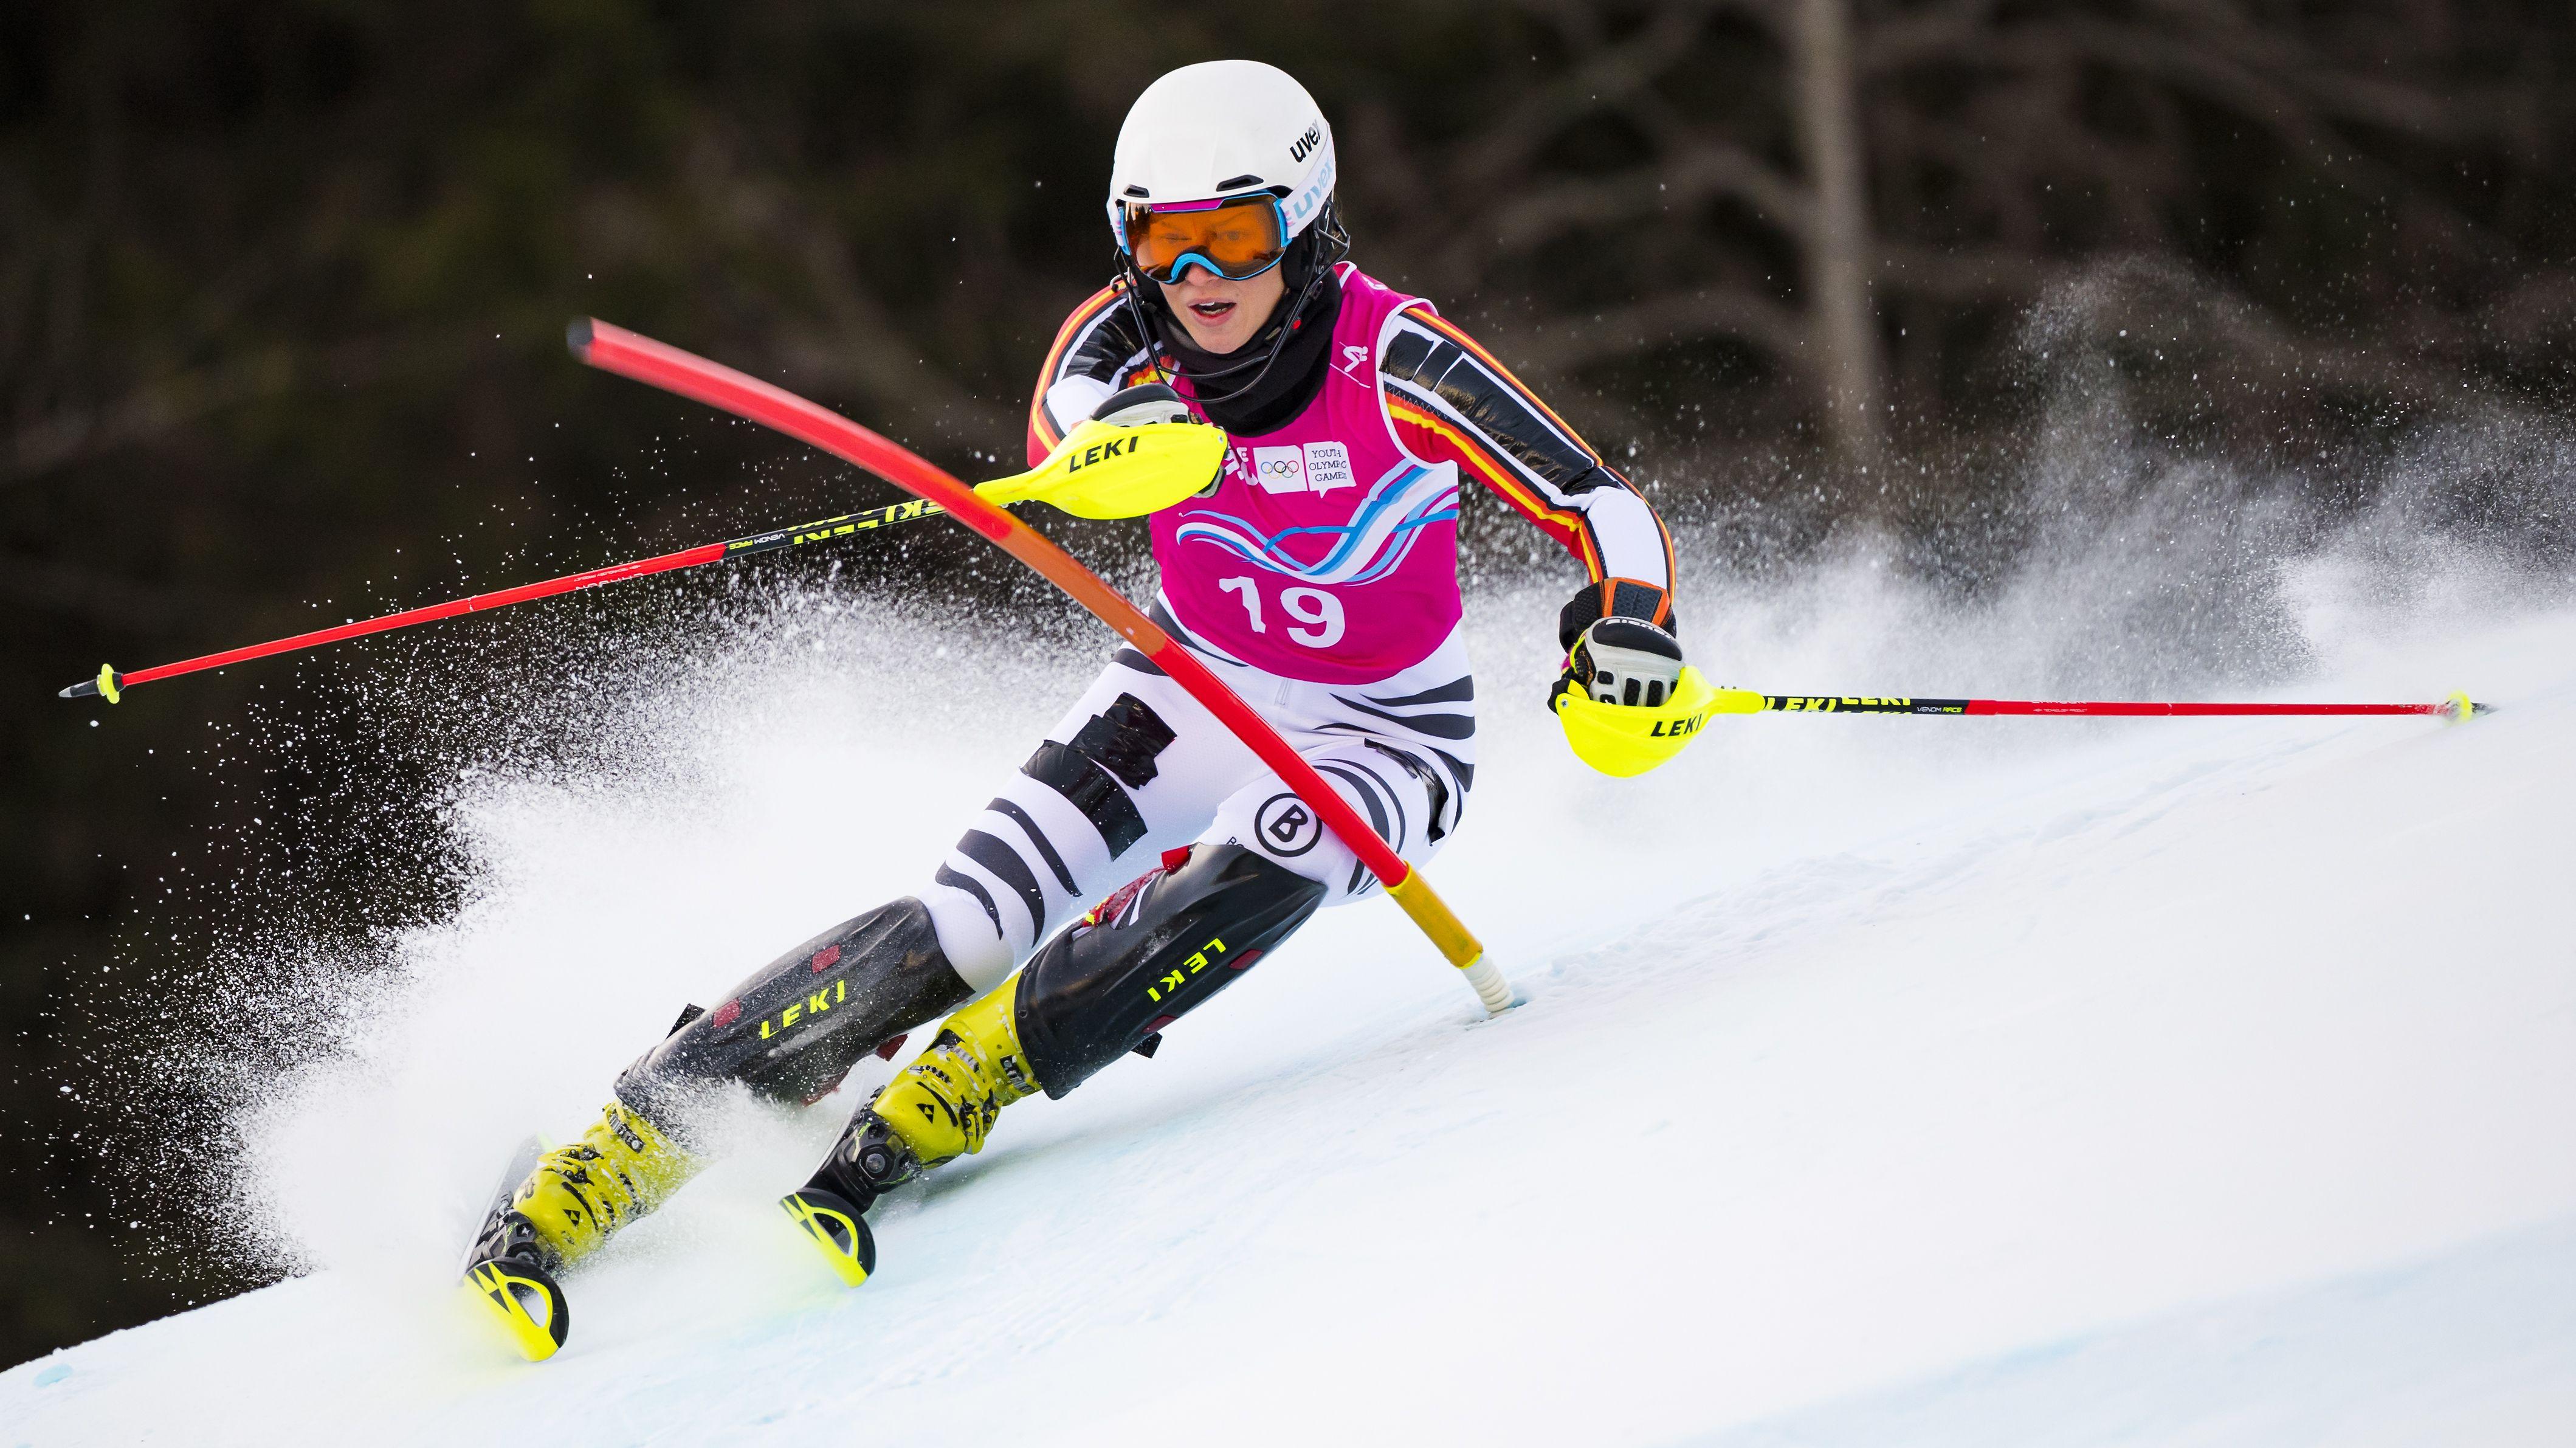 Ski-Youngster Lara Klein